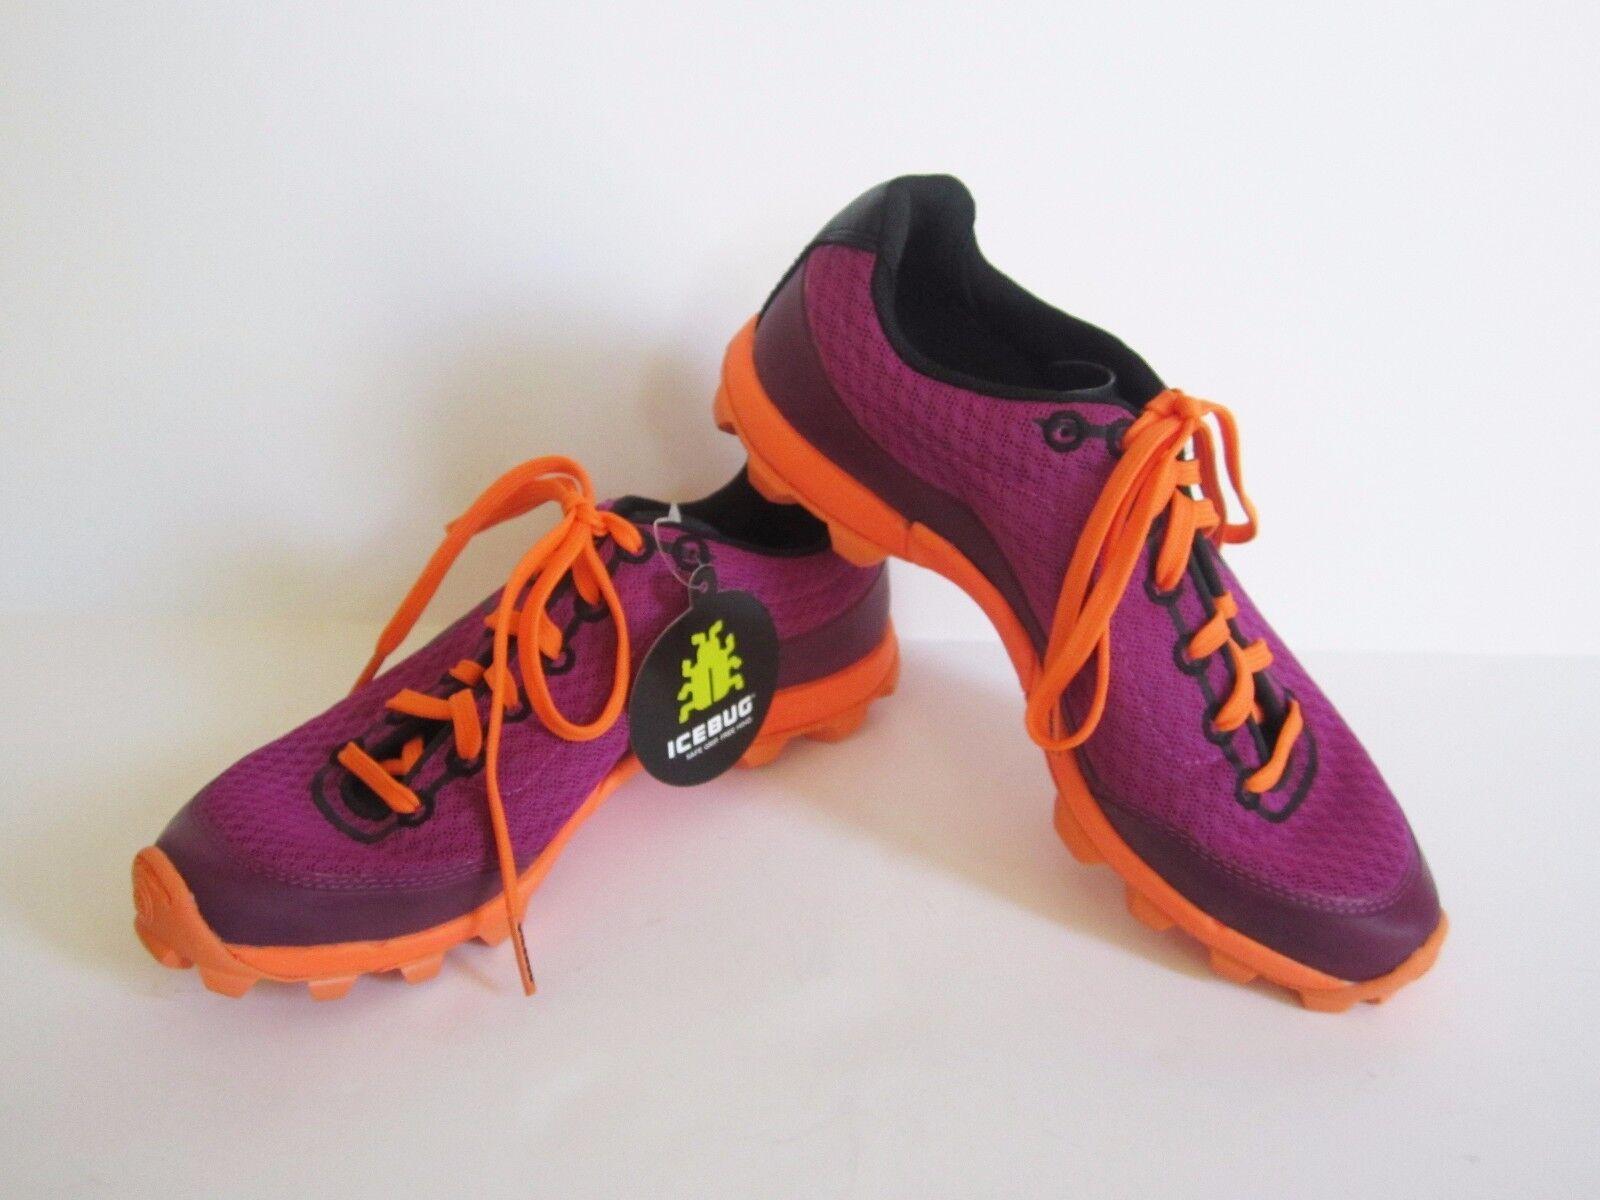 Icebug Womens Acceleritas5 W RB9X Magenta Neon orange Running shoes 5.5 New  TL